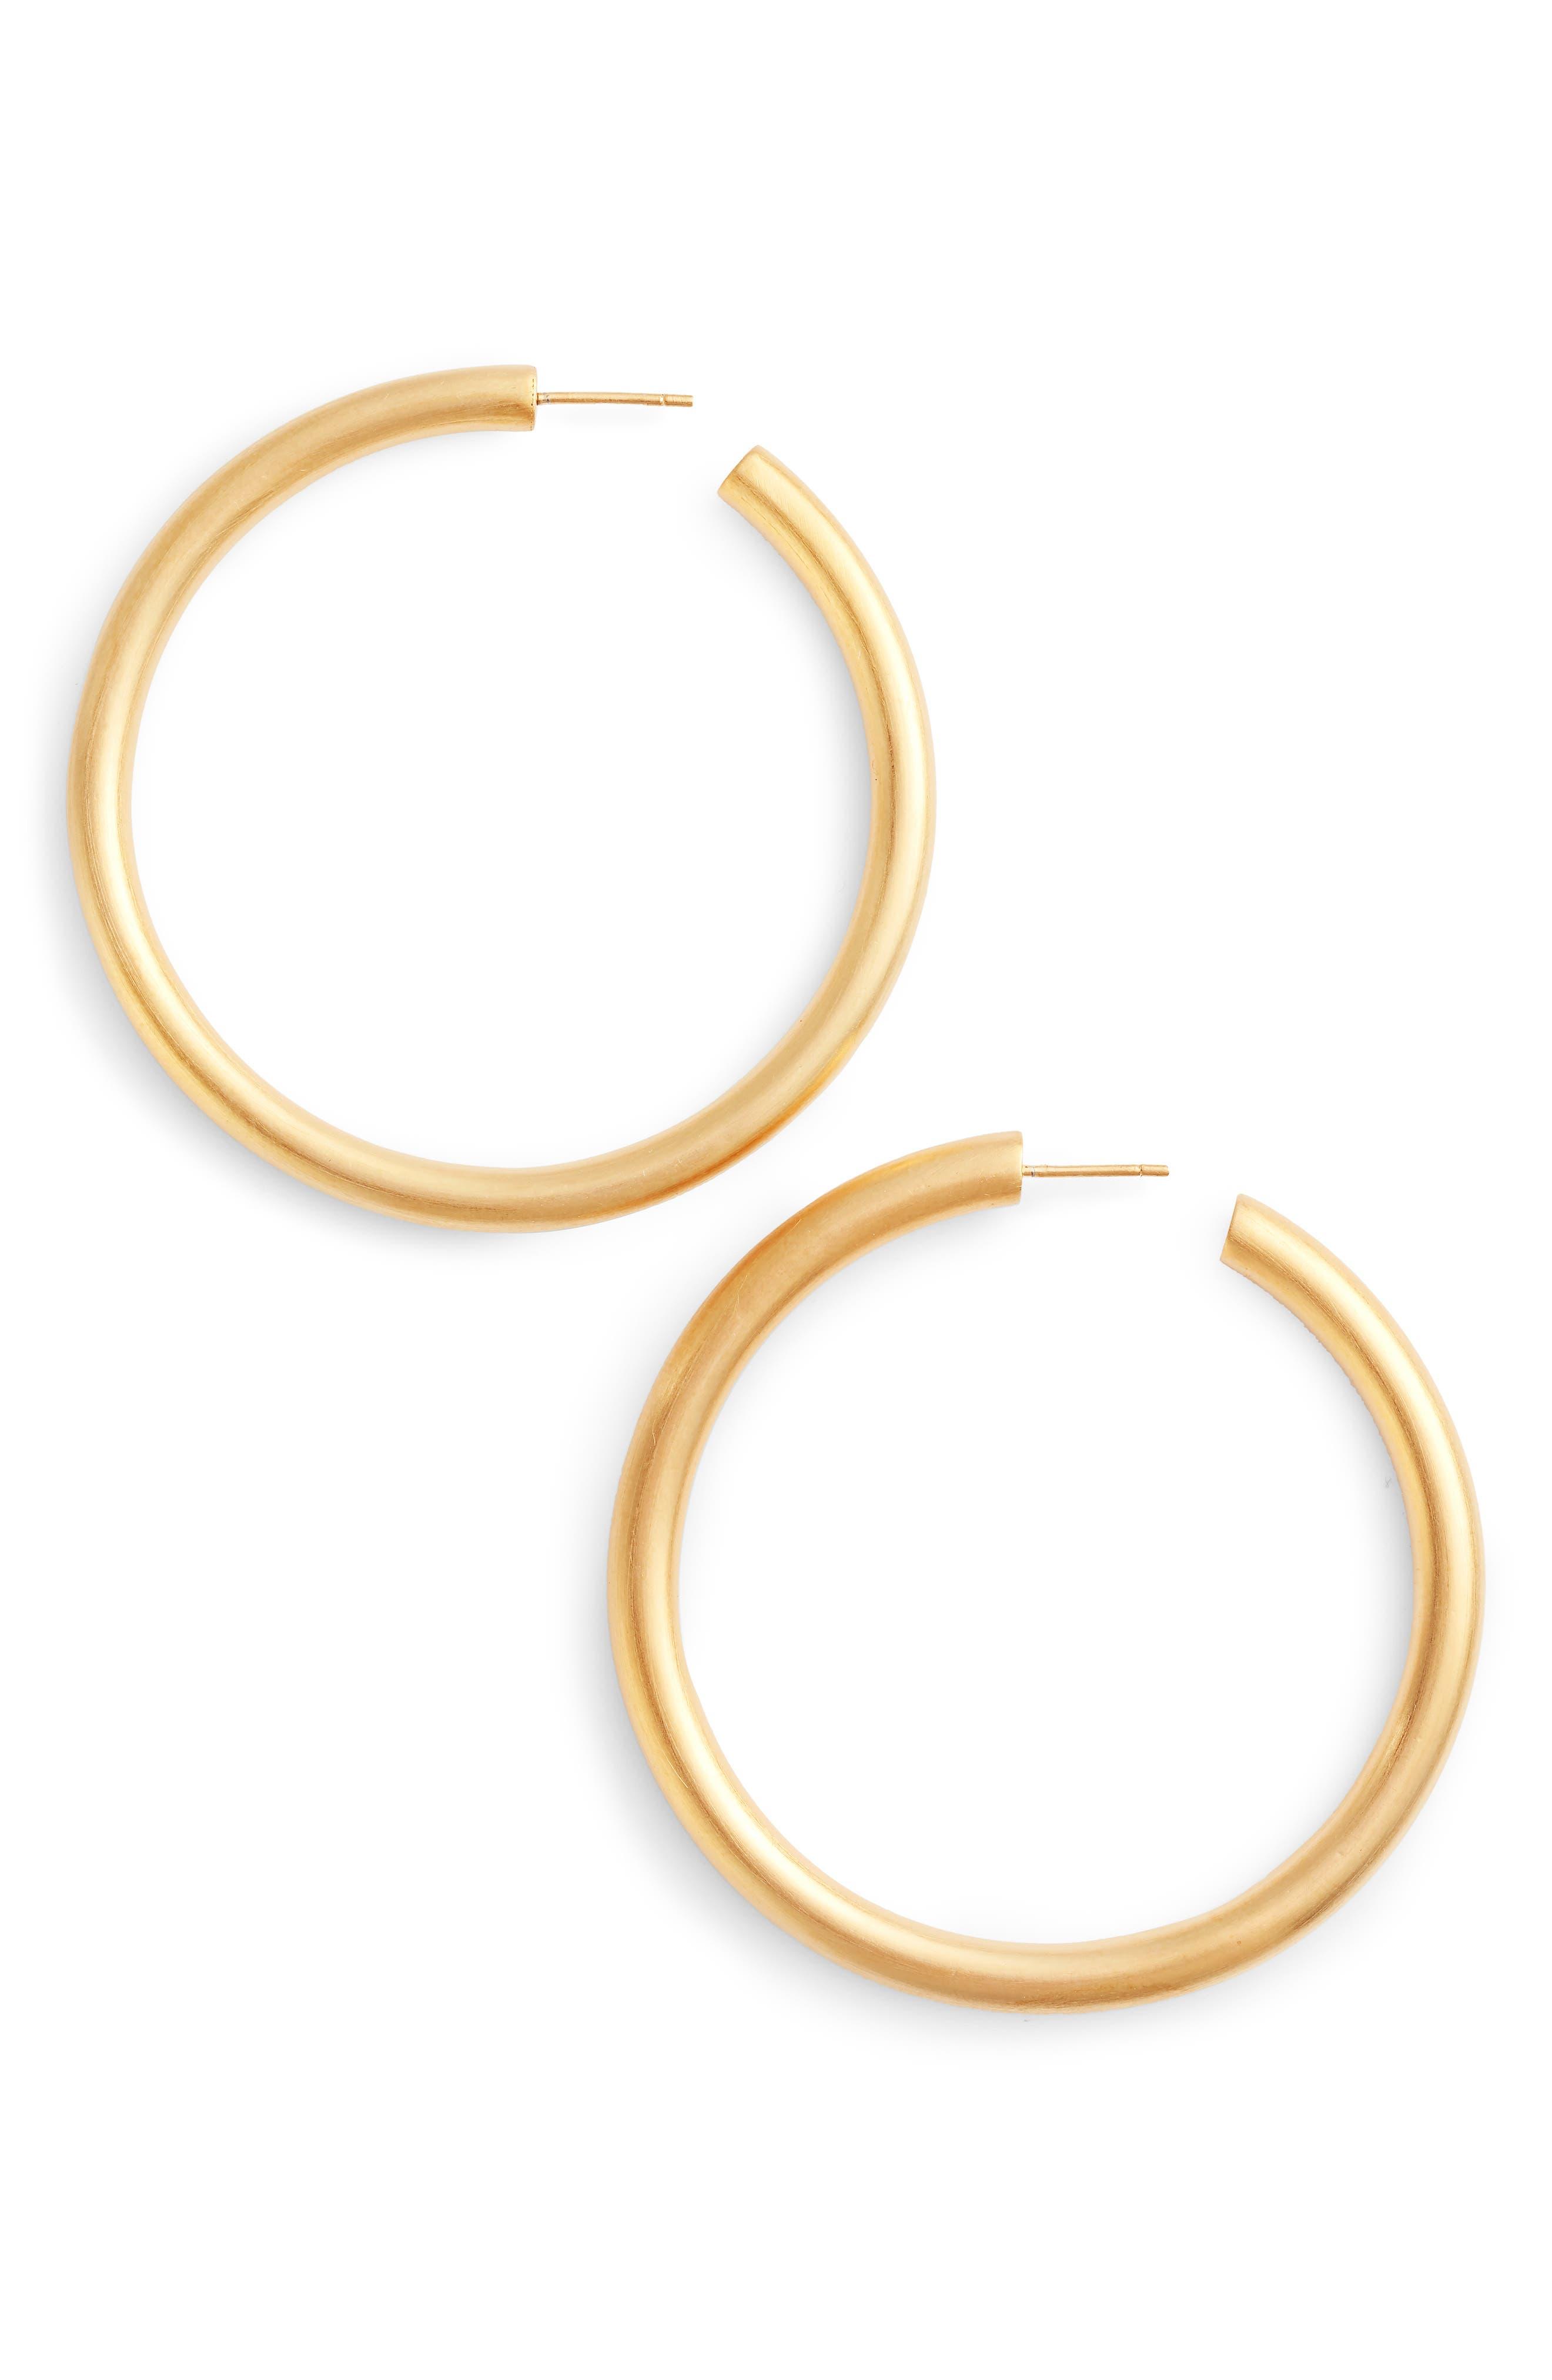 Ipanema Hoop Earrings,                         Main,                         color, Gold